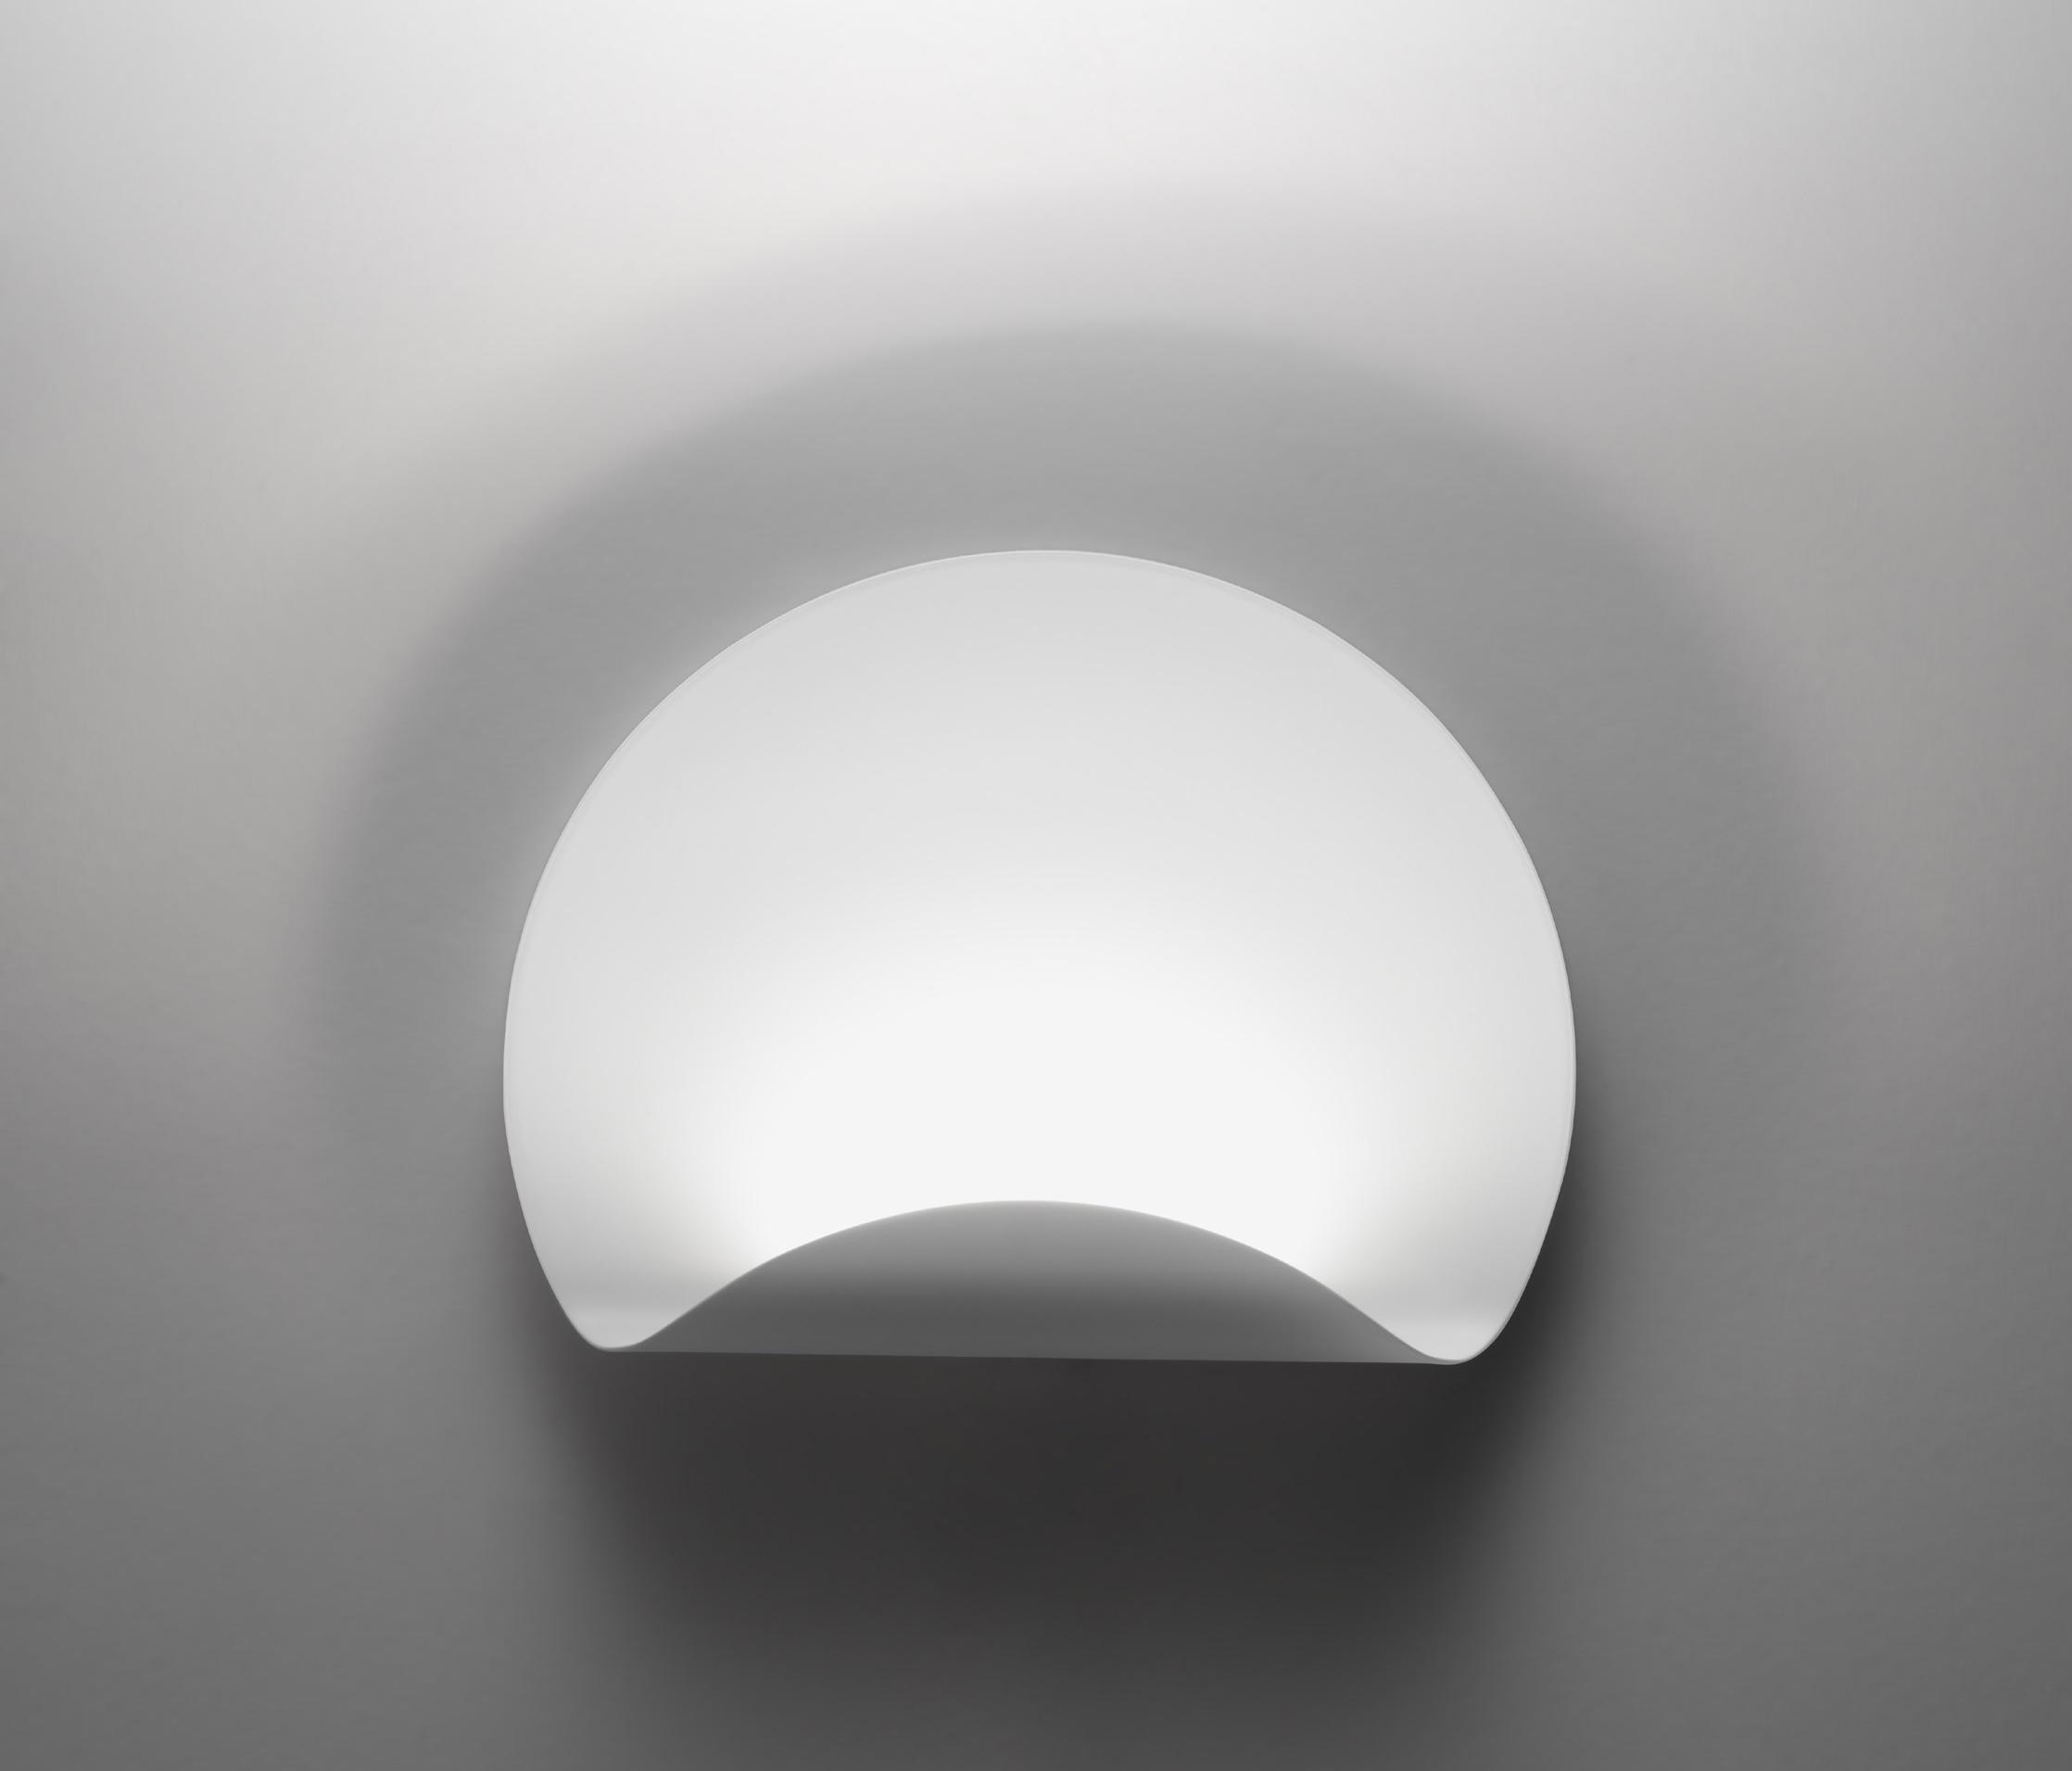 Dinarco parete lampade parete artemide architonic - Lampade da parete design ...